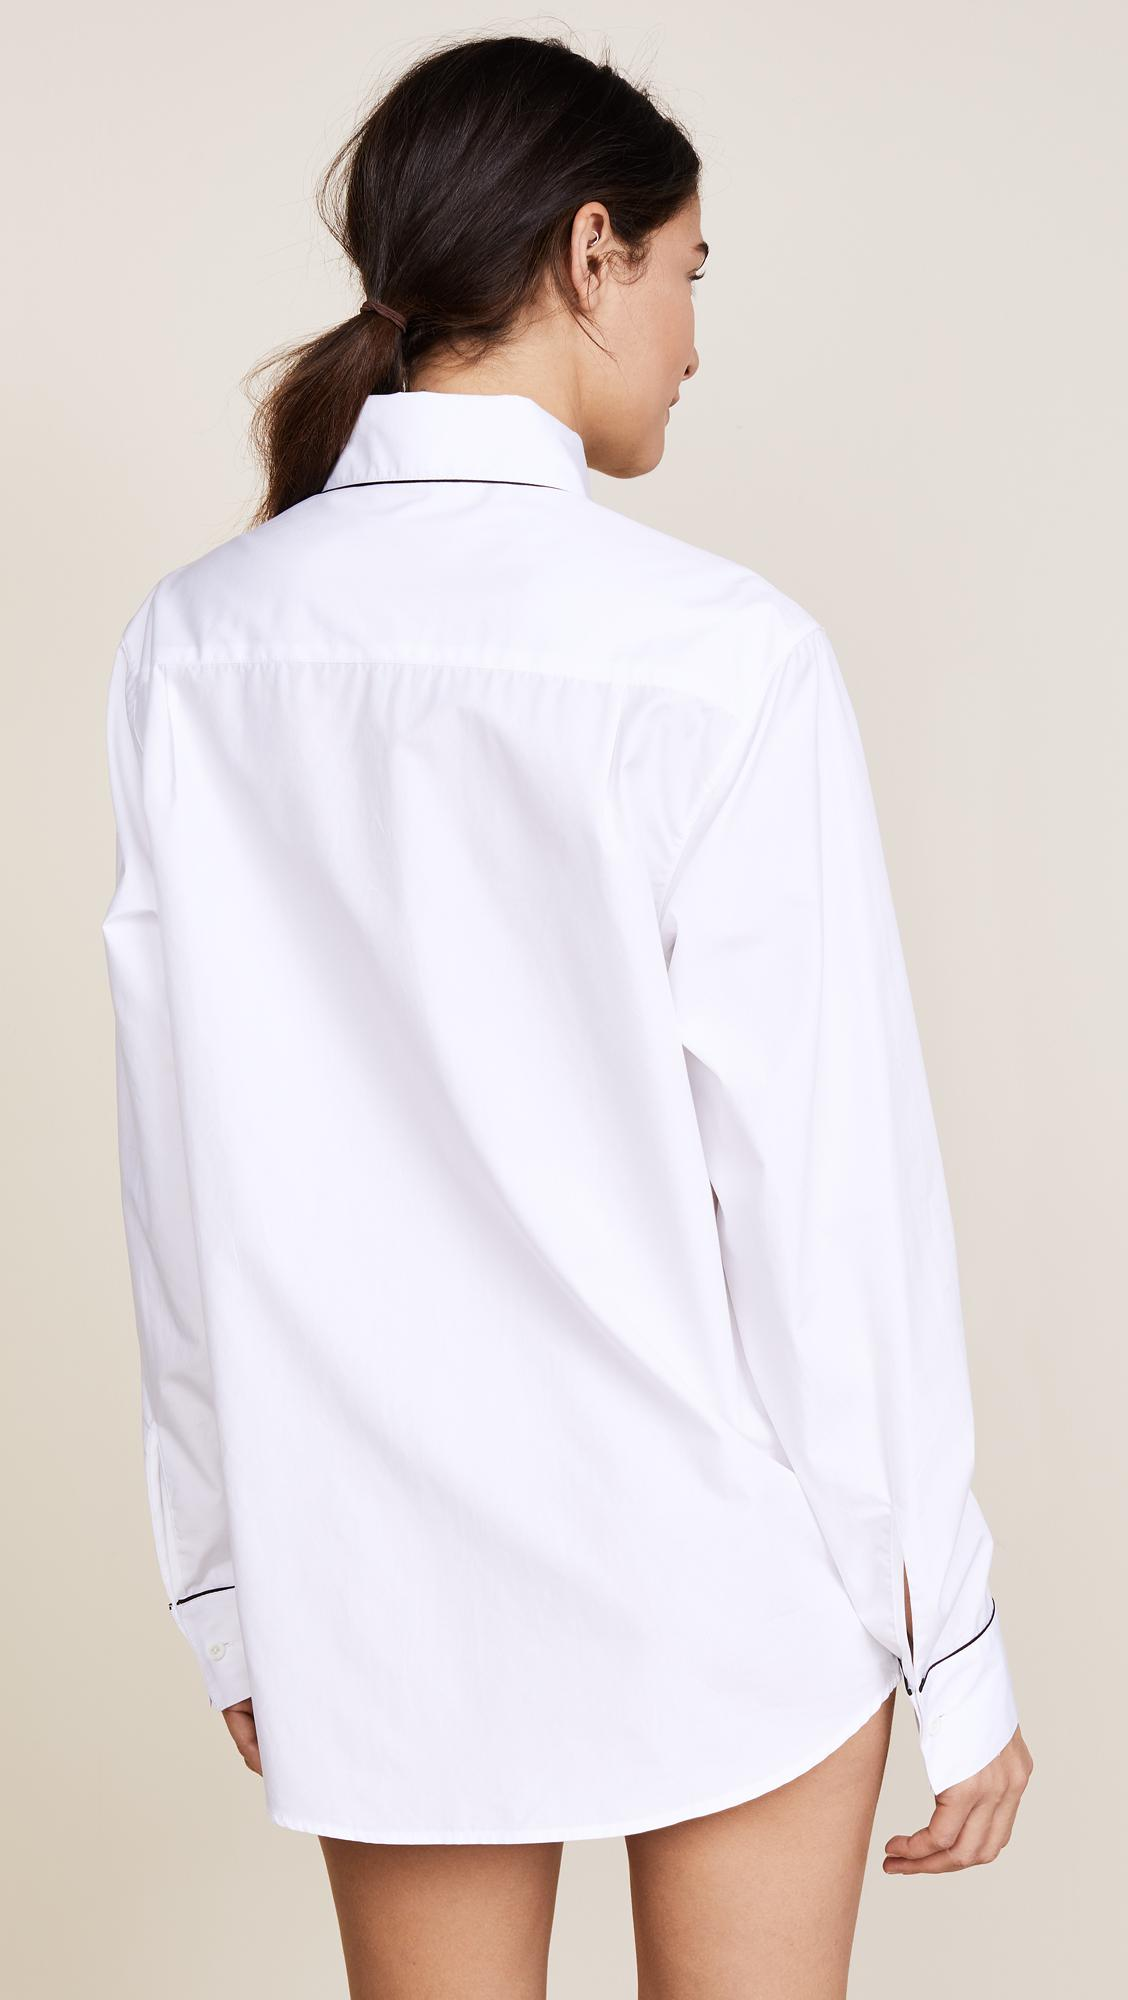 Lyst - Kiki de Montparnasse New Boyfriend Shirt in White 69a505ad0